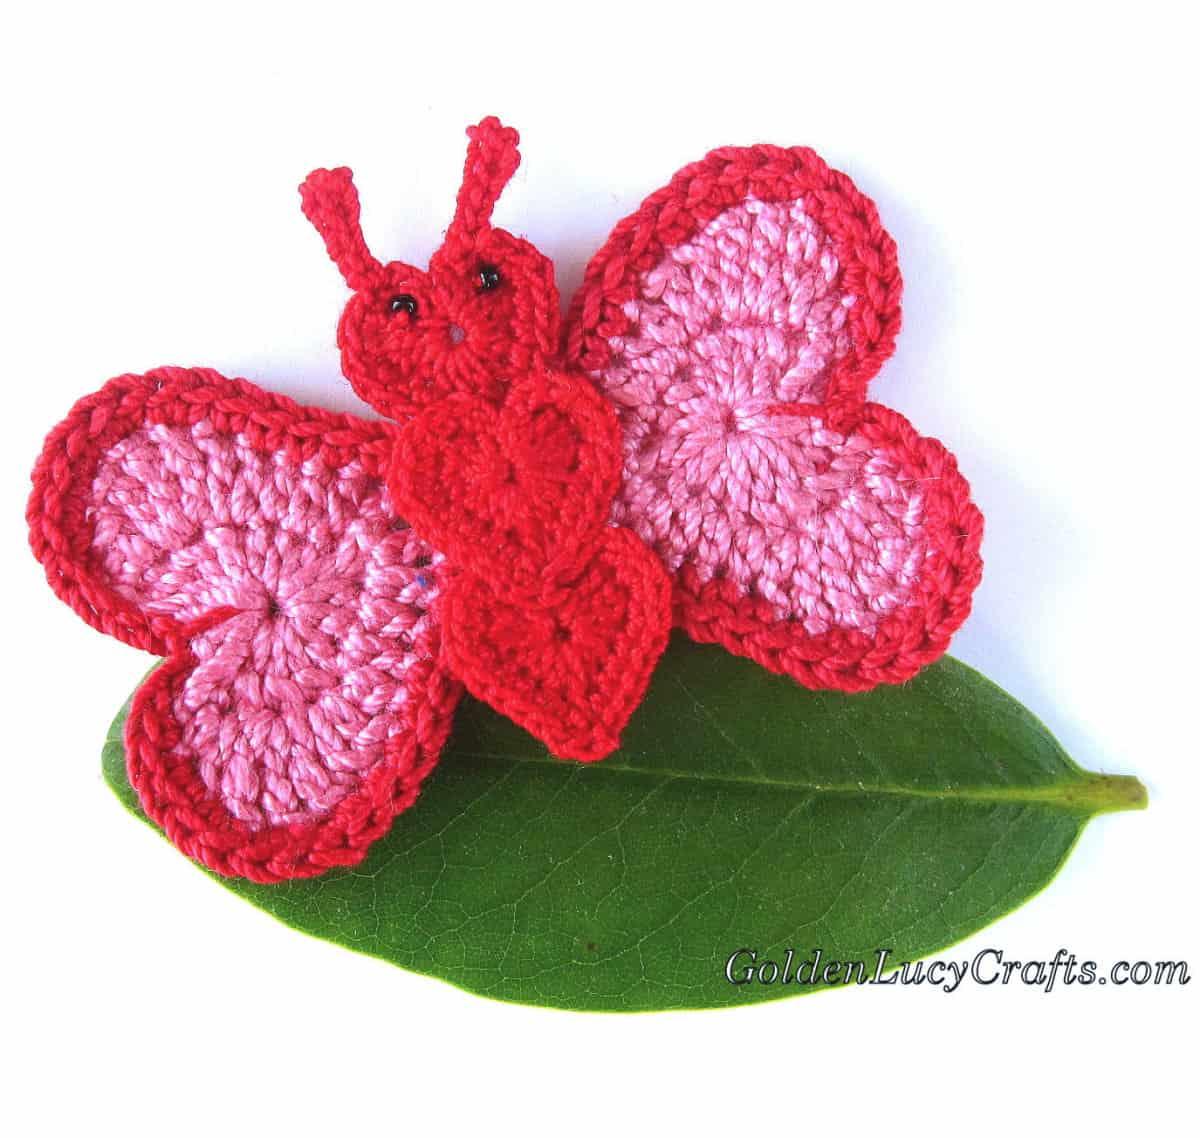 Crochet butterfly applique on the green leaf.